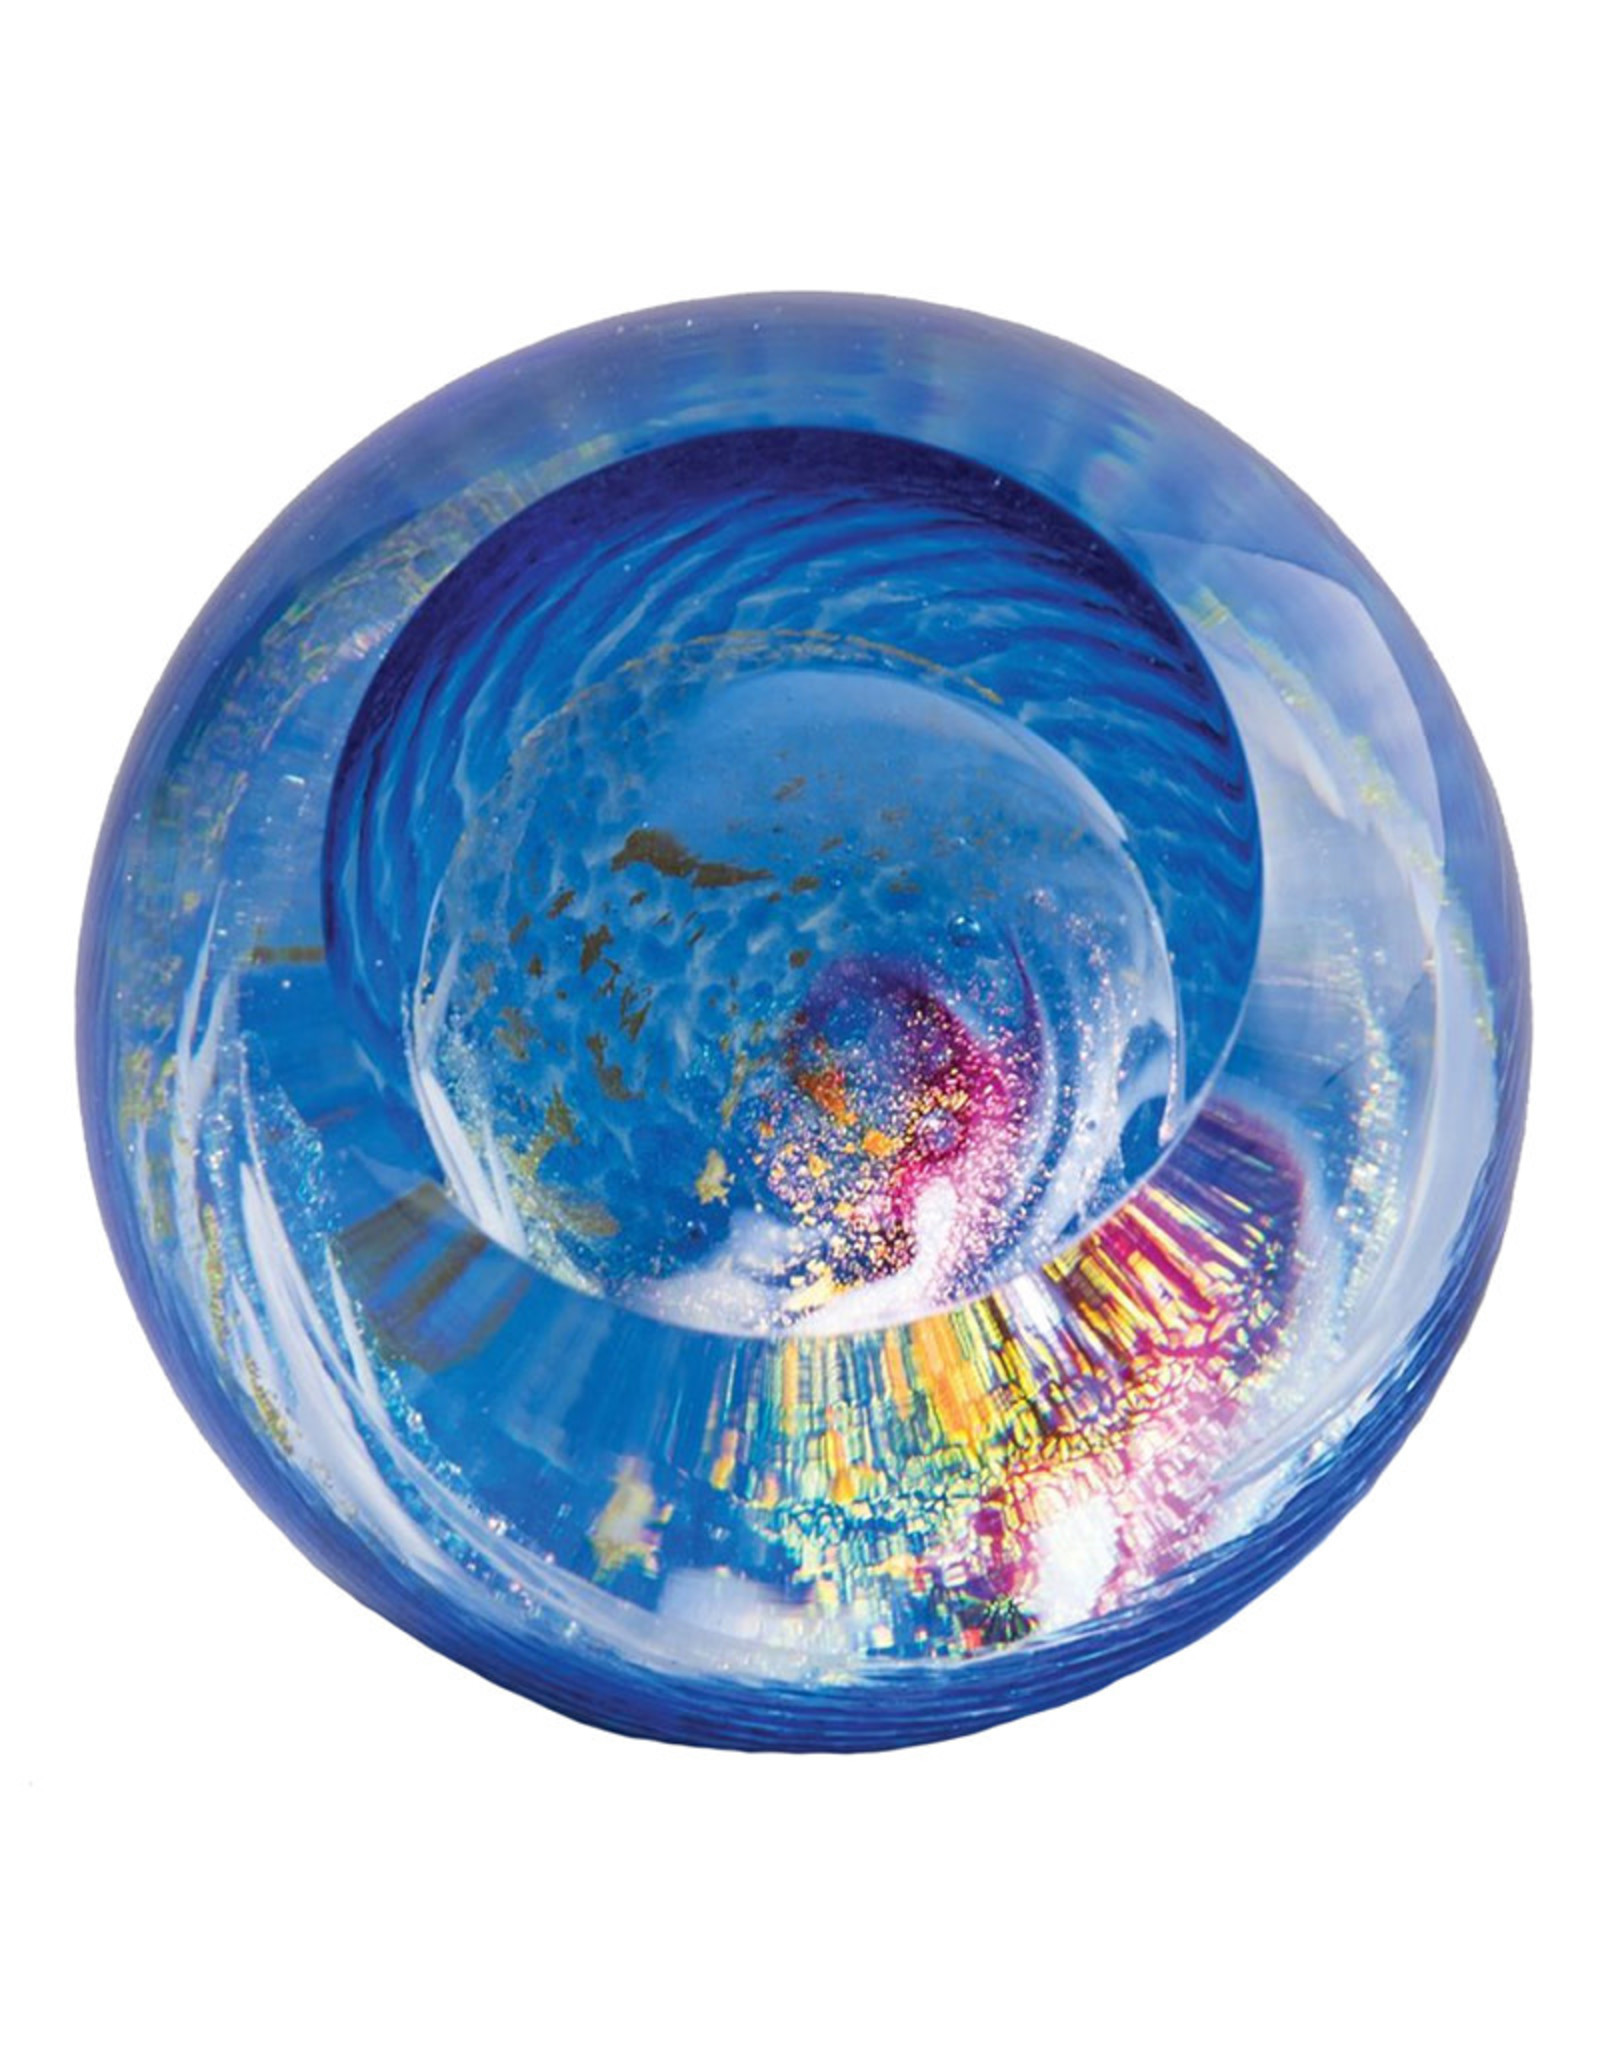 GLASS EYE MILKY WAY CELESTIAL PAPERWEIGHT